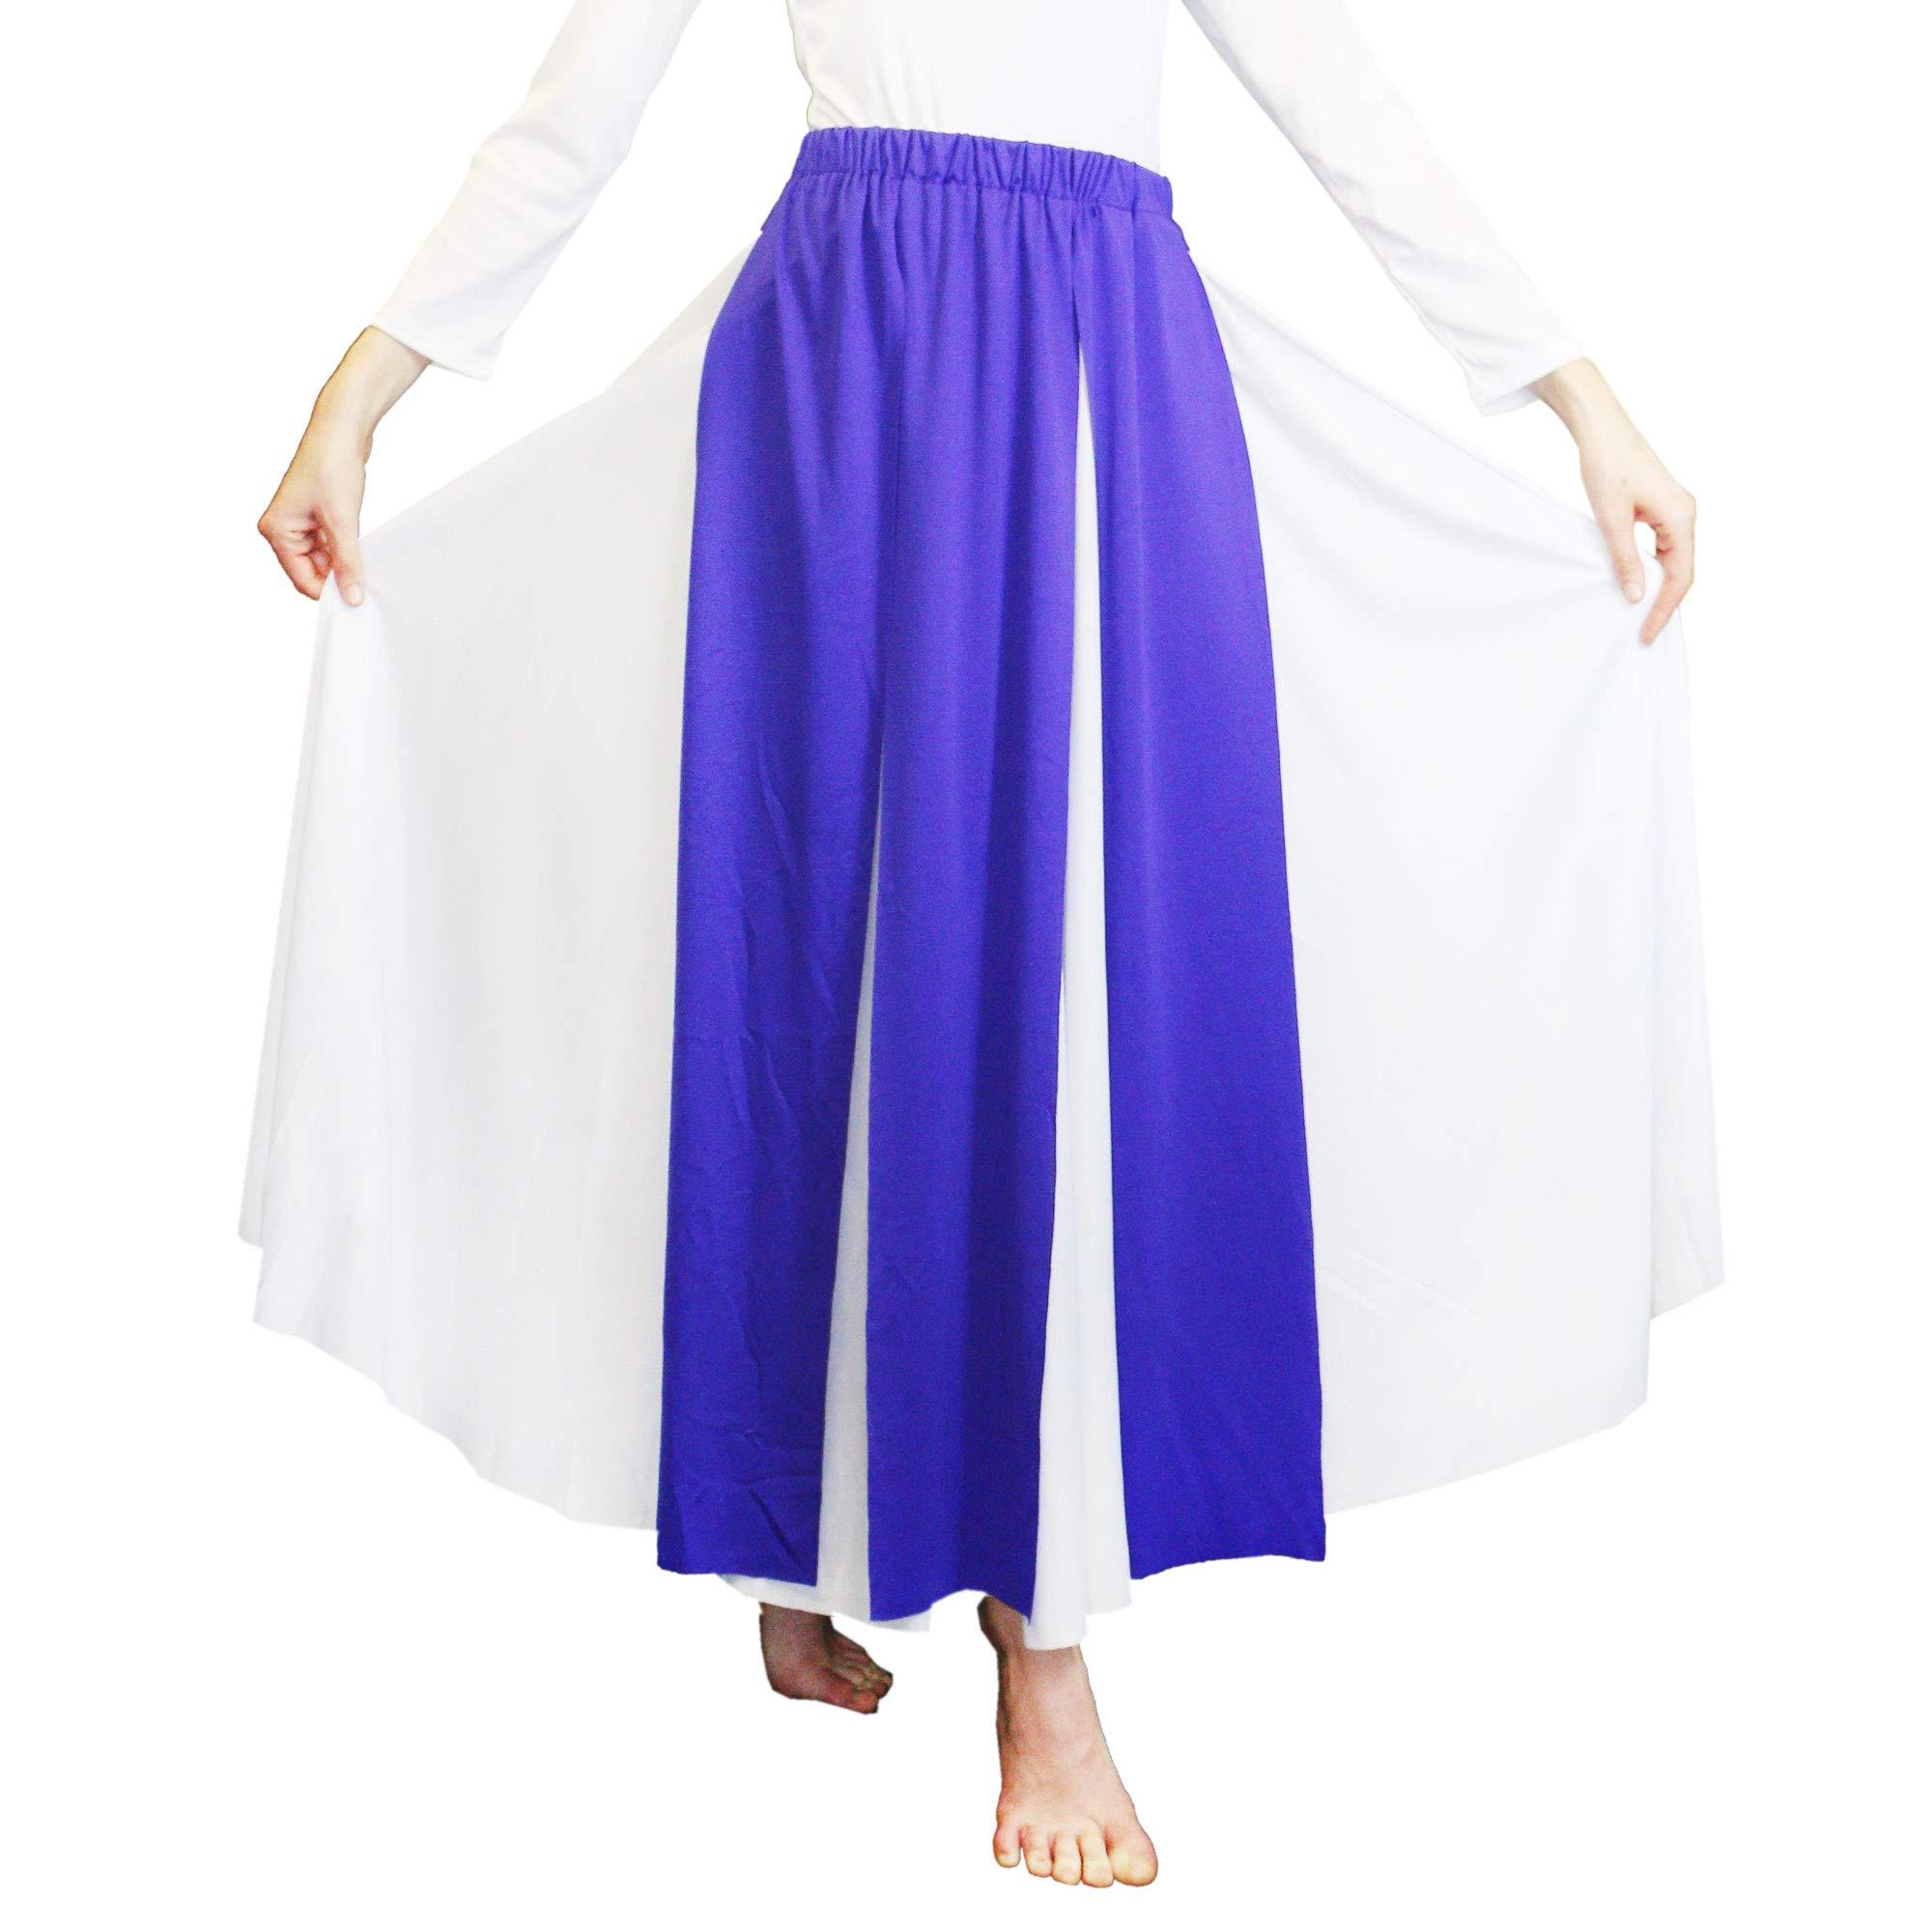 Danzcue Praise Dance Streamer Skirt, Deep Purple, L-XL-Adult by Danzcue